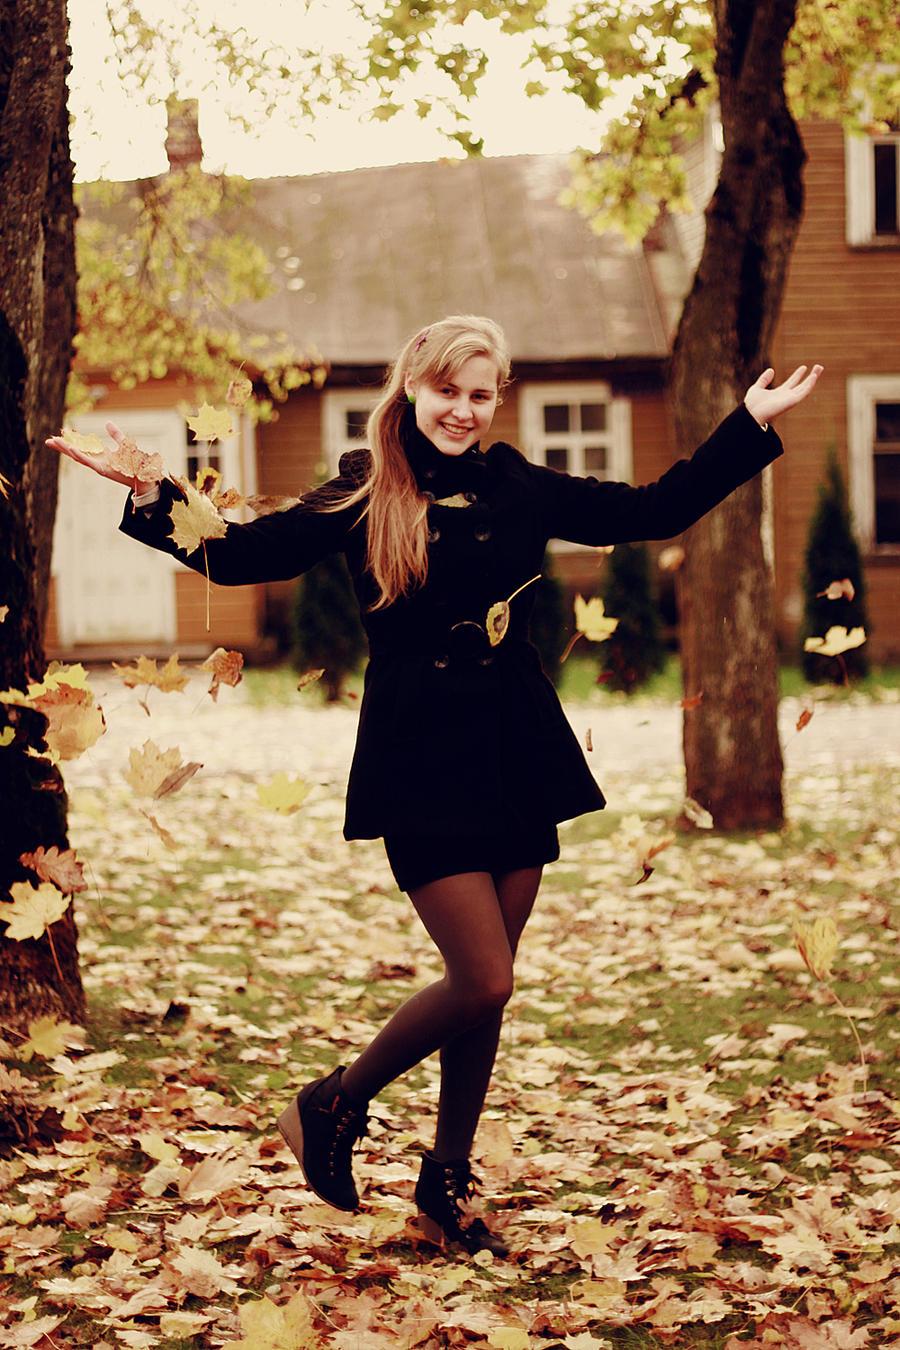 Izrazite svoja osecanja slikom Hello_autumn_ii_by_zi0oto-d4d4biy